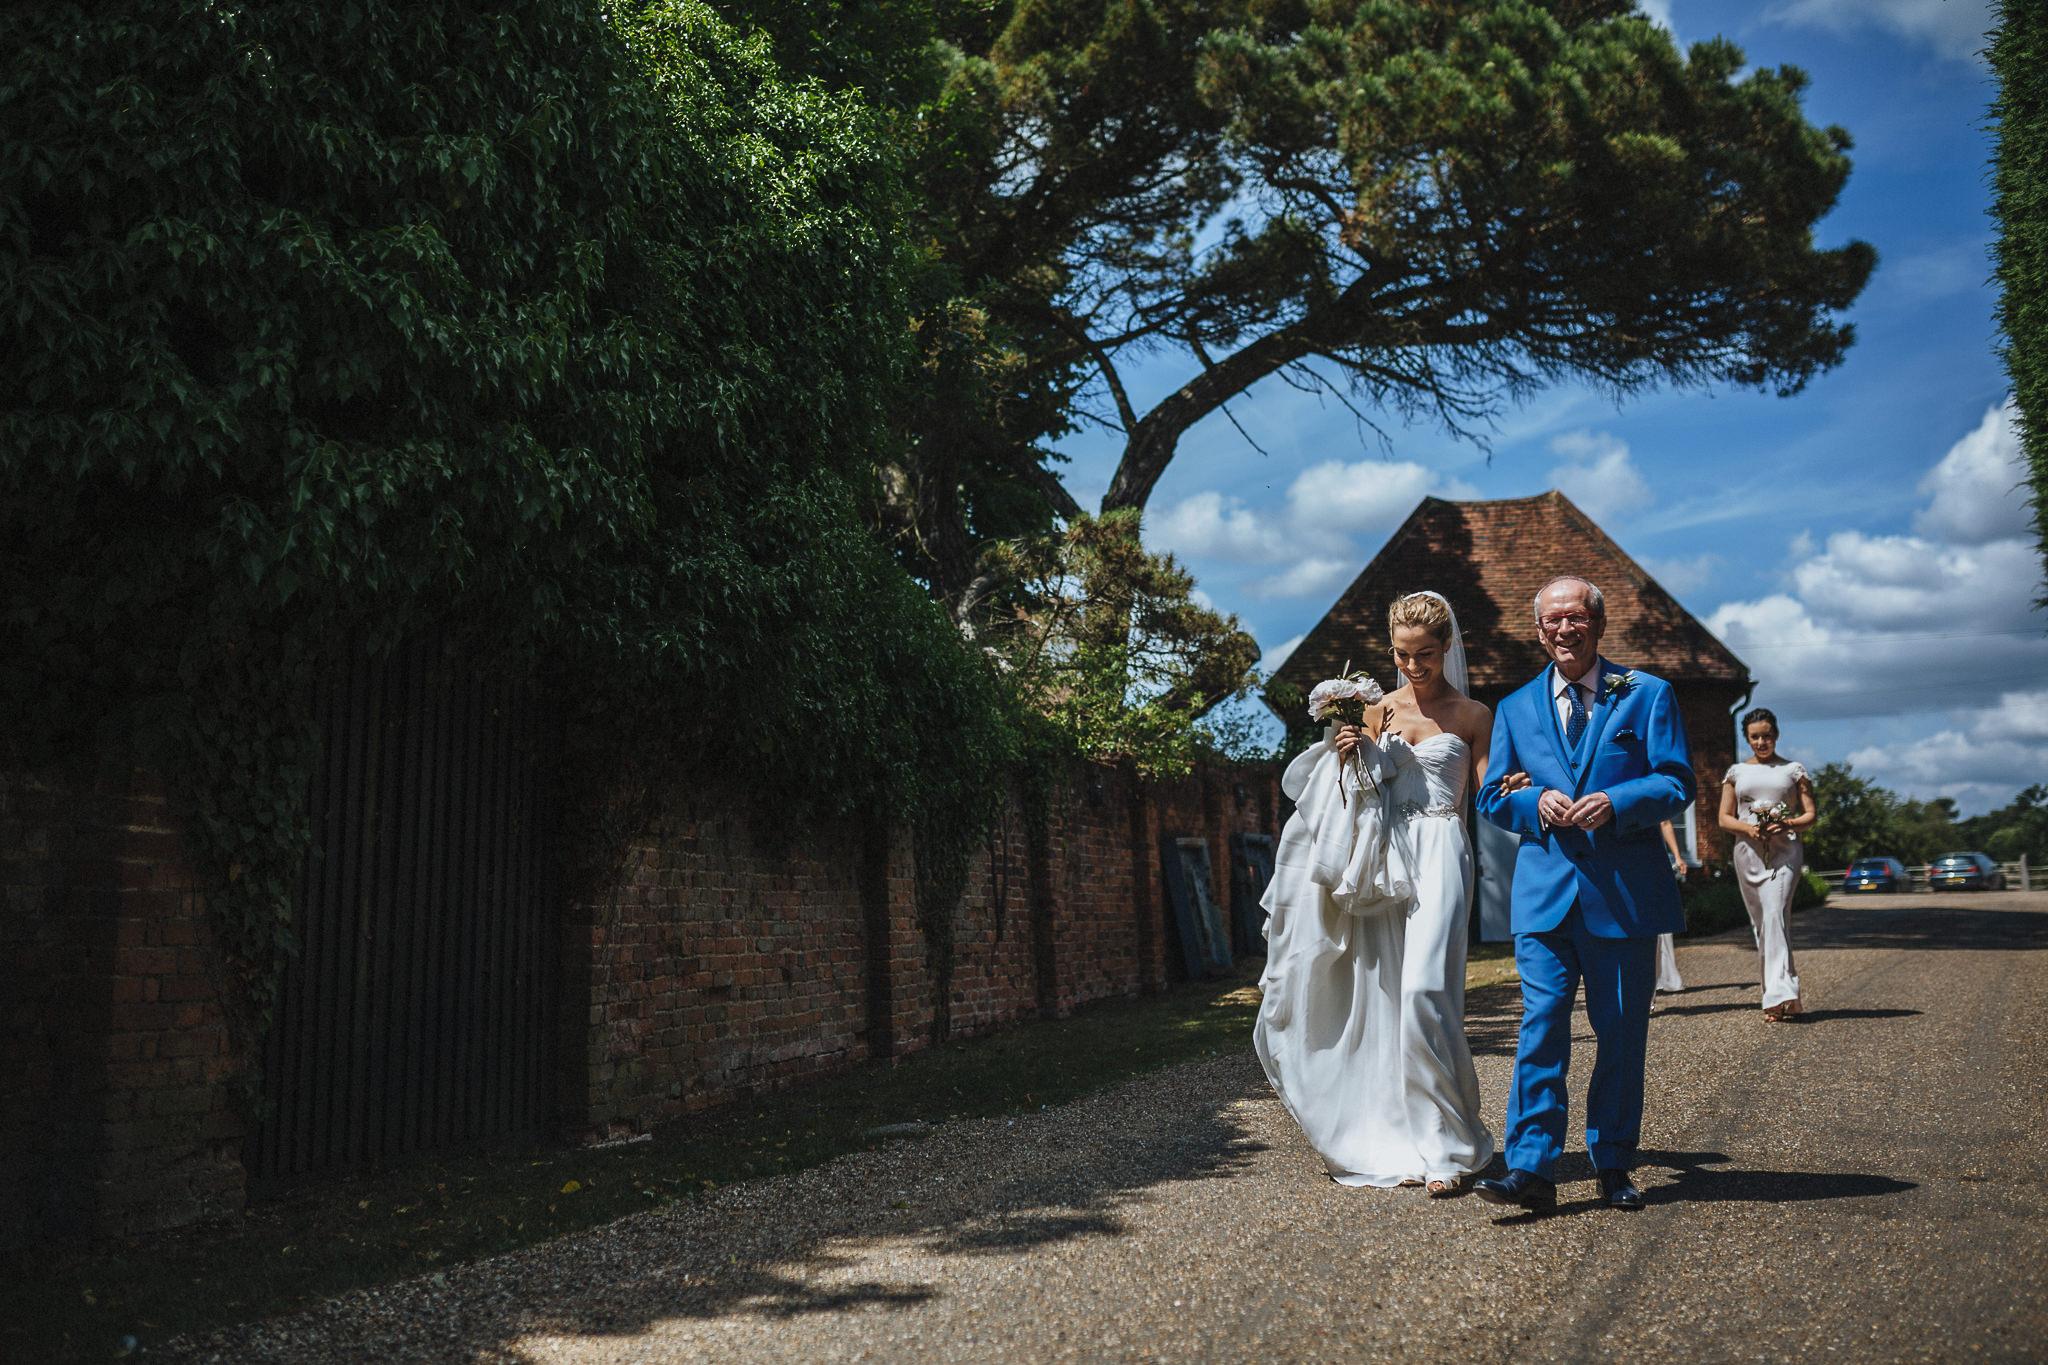 paul-marbrook-Gaynes-Park Wedding-Photographer-90036